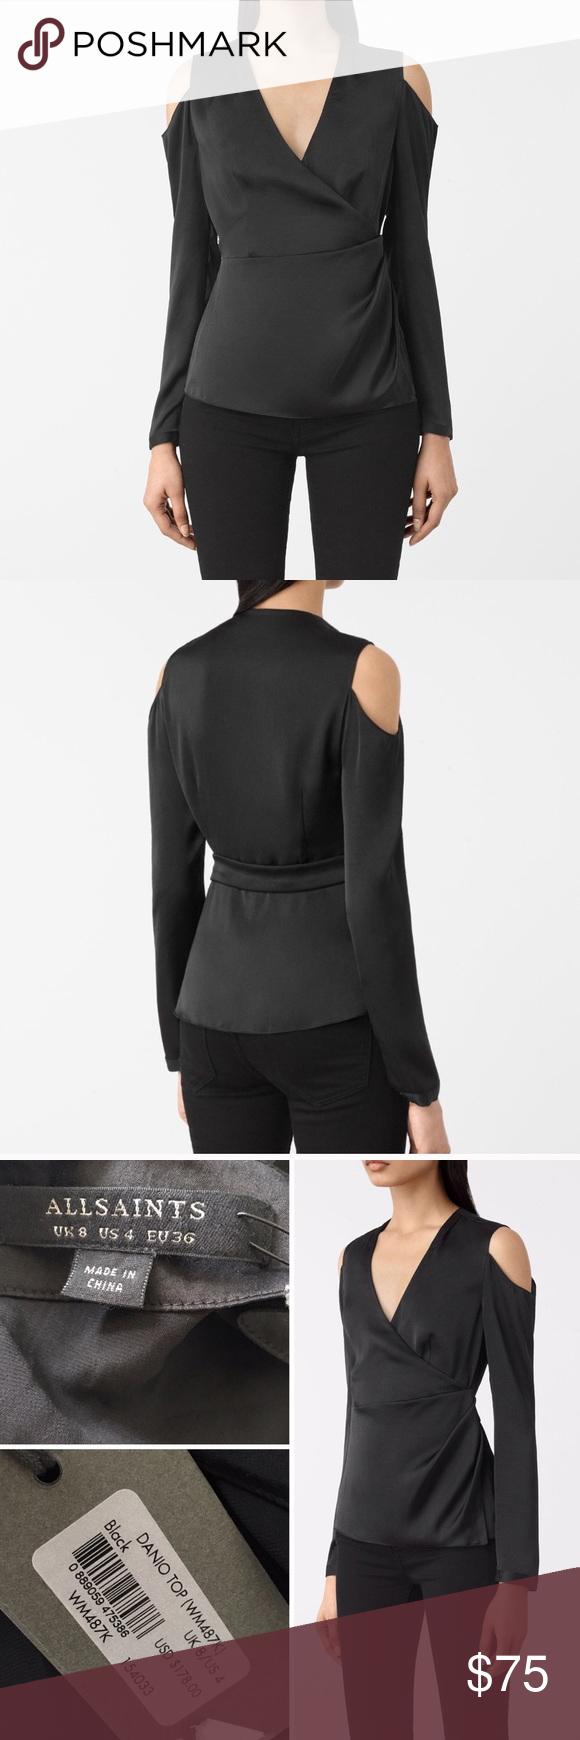 f83f1e00b2238 NWT 💋 ALL SAINTS Danio Cold Shoulder Top BLACK Never worn - still has tag  attached